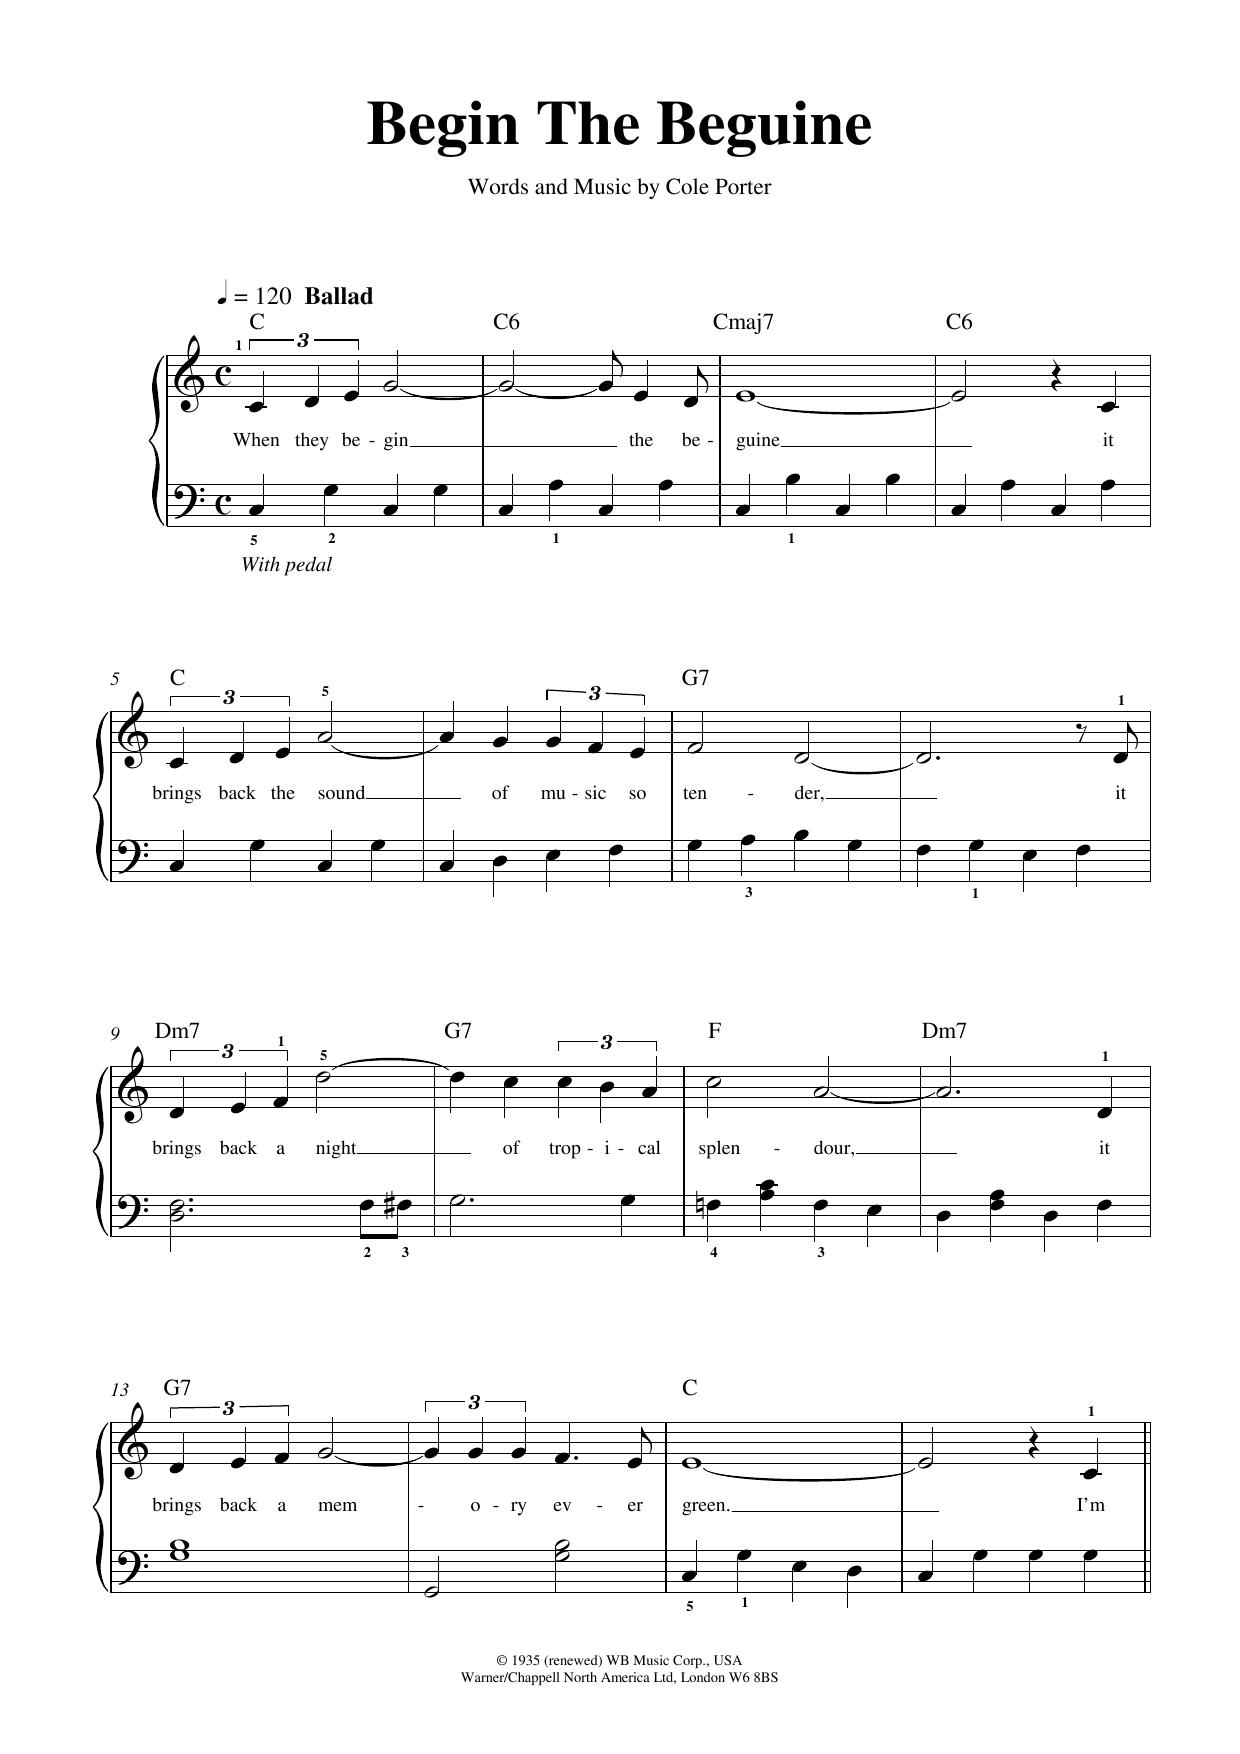 Begin The Beguine Sheet Music